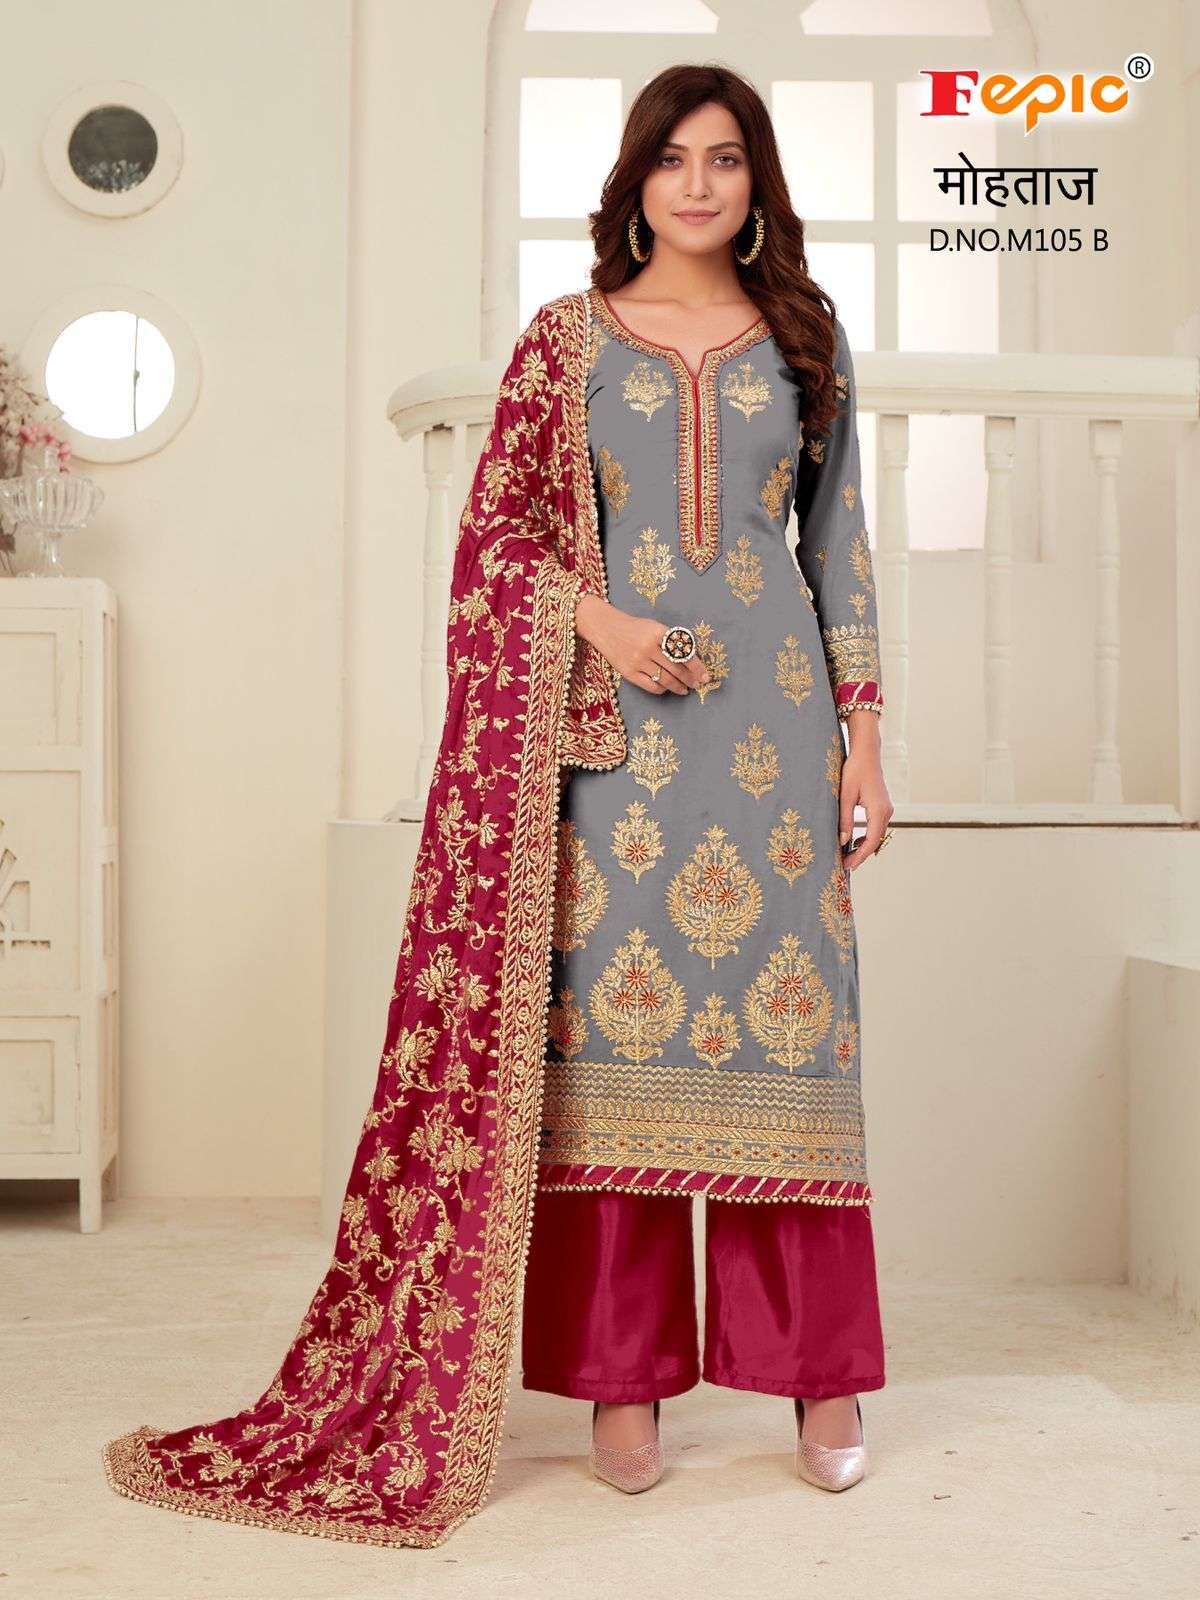 Mohtaz Vol 2 By Fepic Georgette Ethnic Wear Fancy Suits